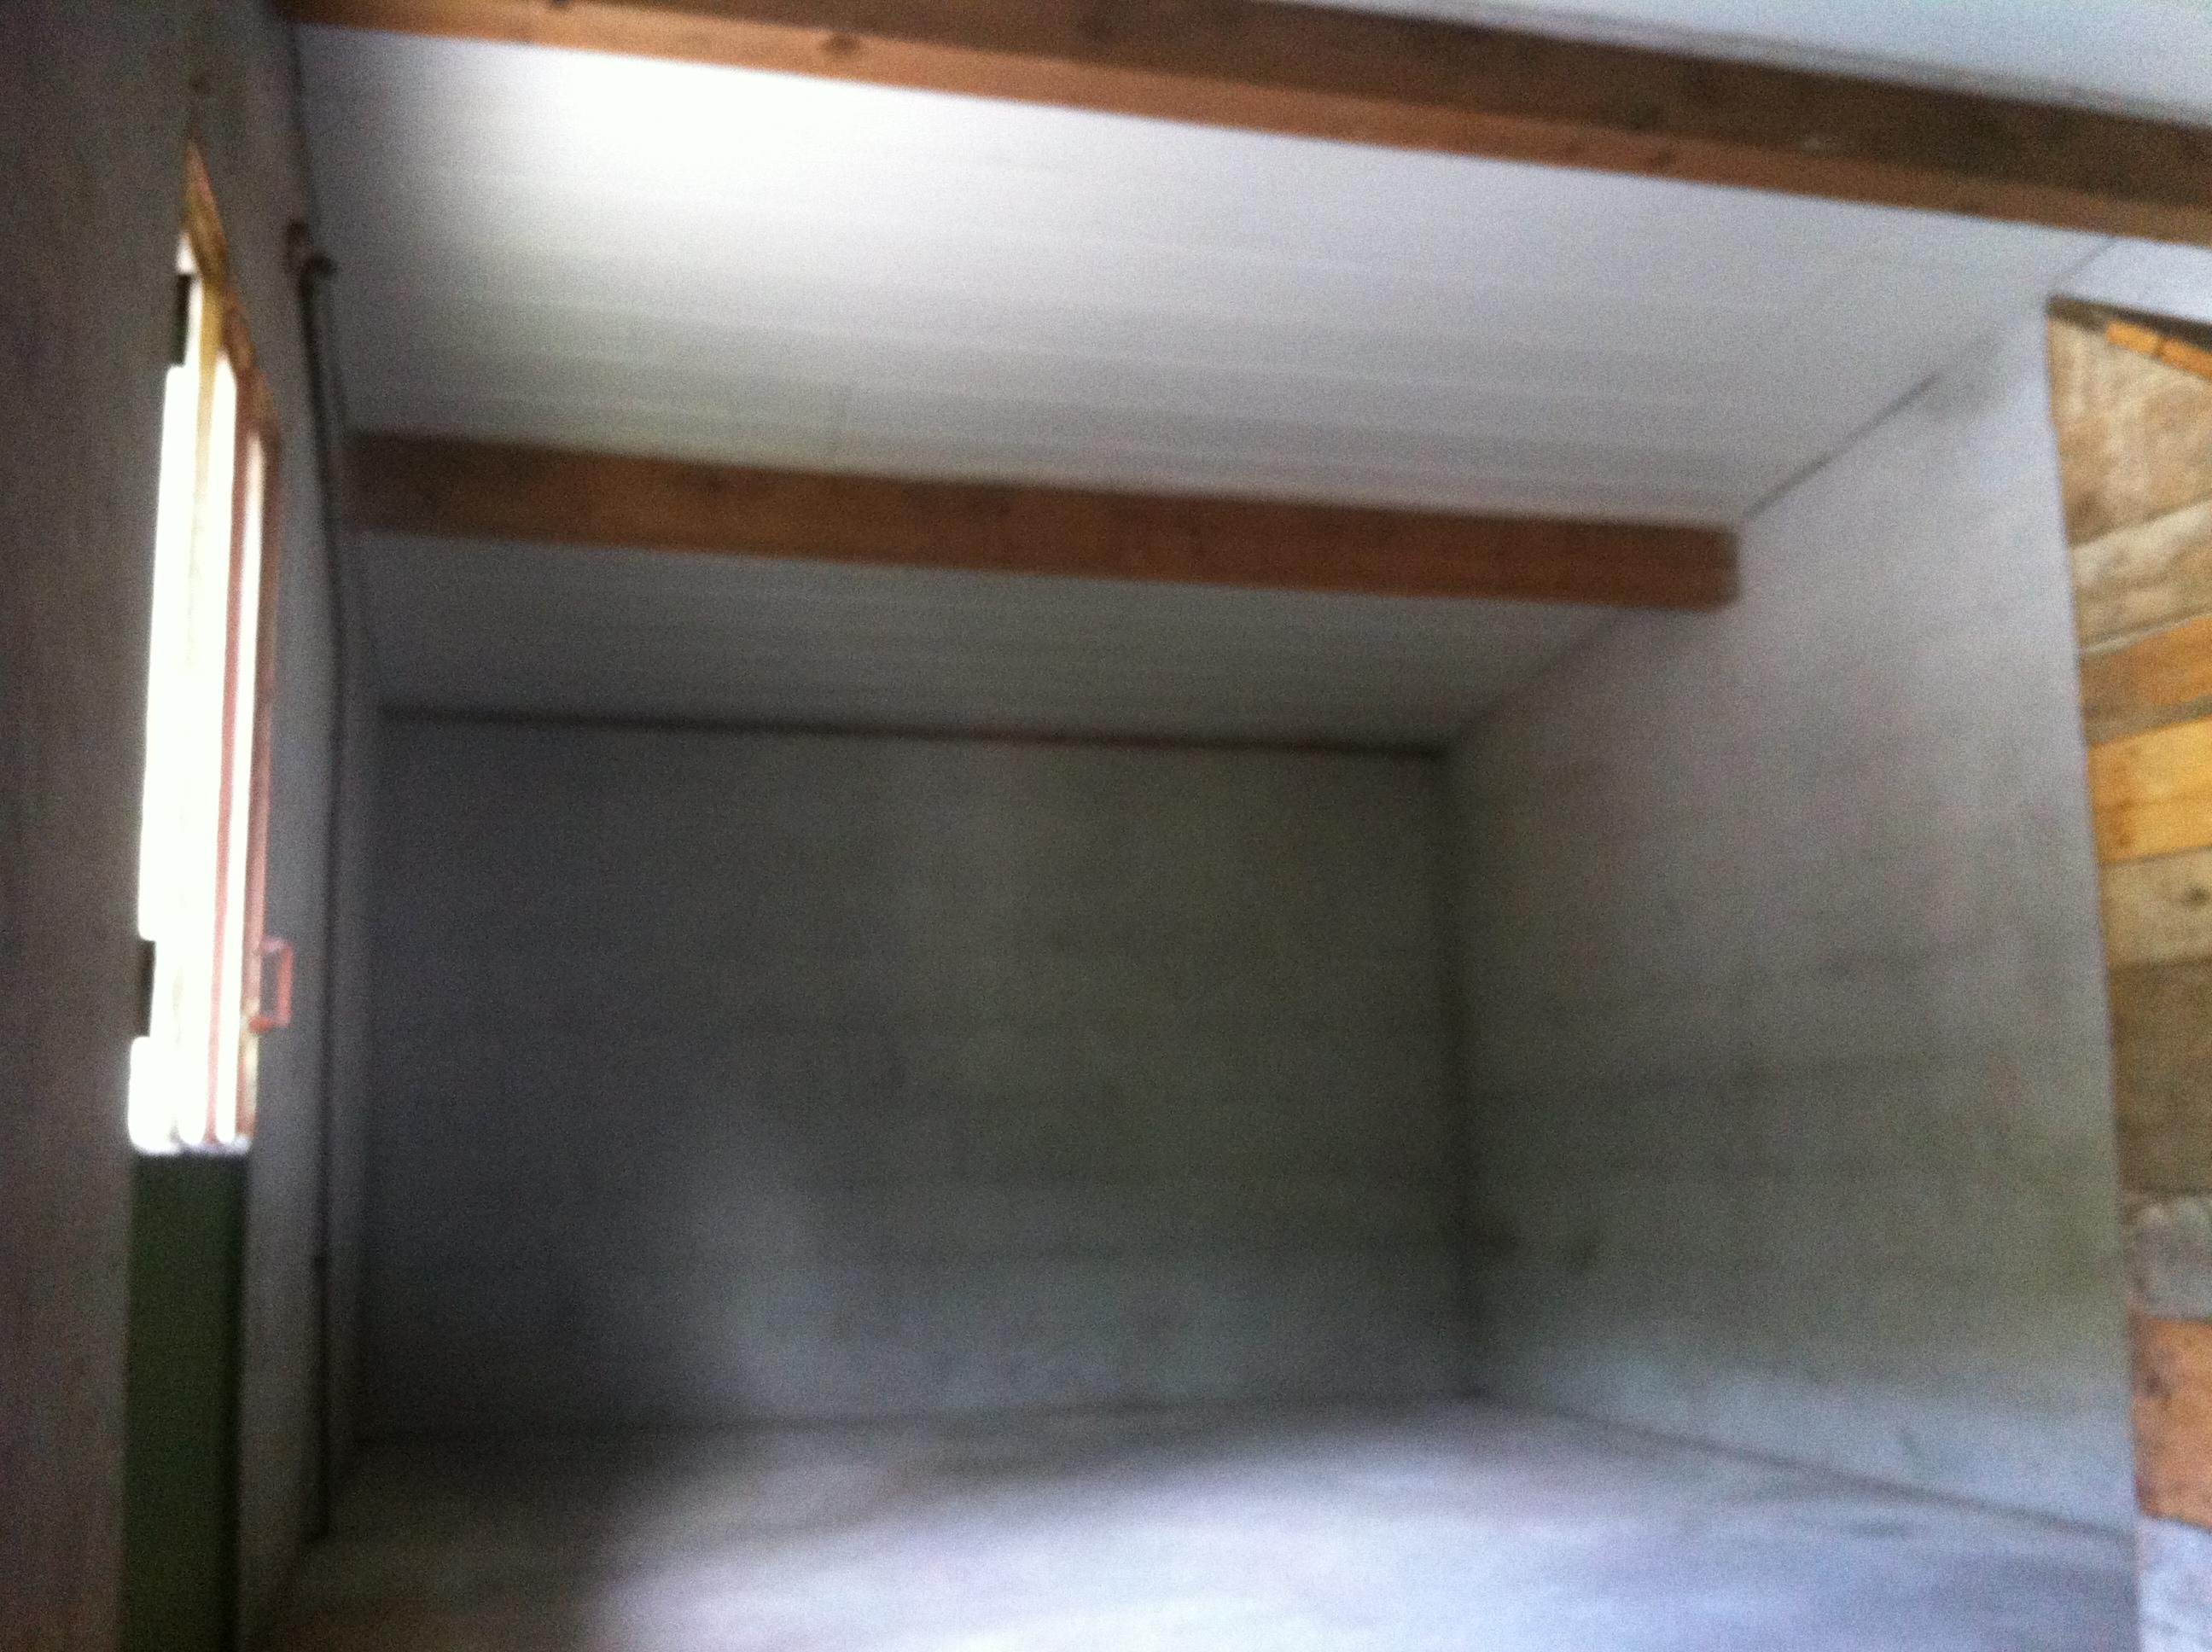 plafond du poulailler et nettoyage blog maison. Black Bedroom Furniture Sets. Home Design Ideas